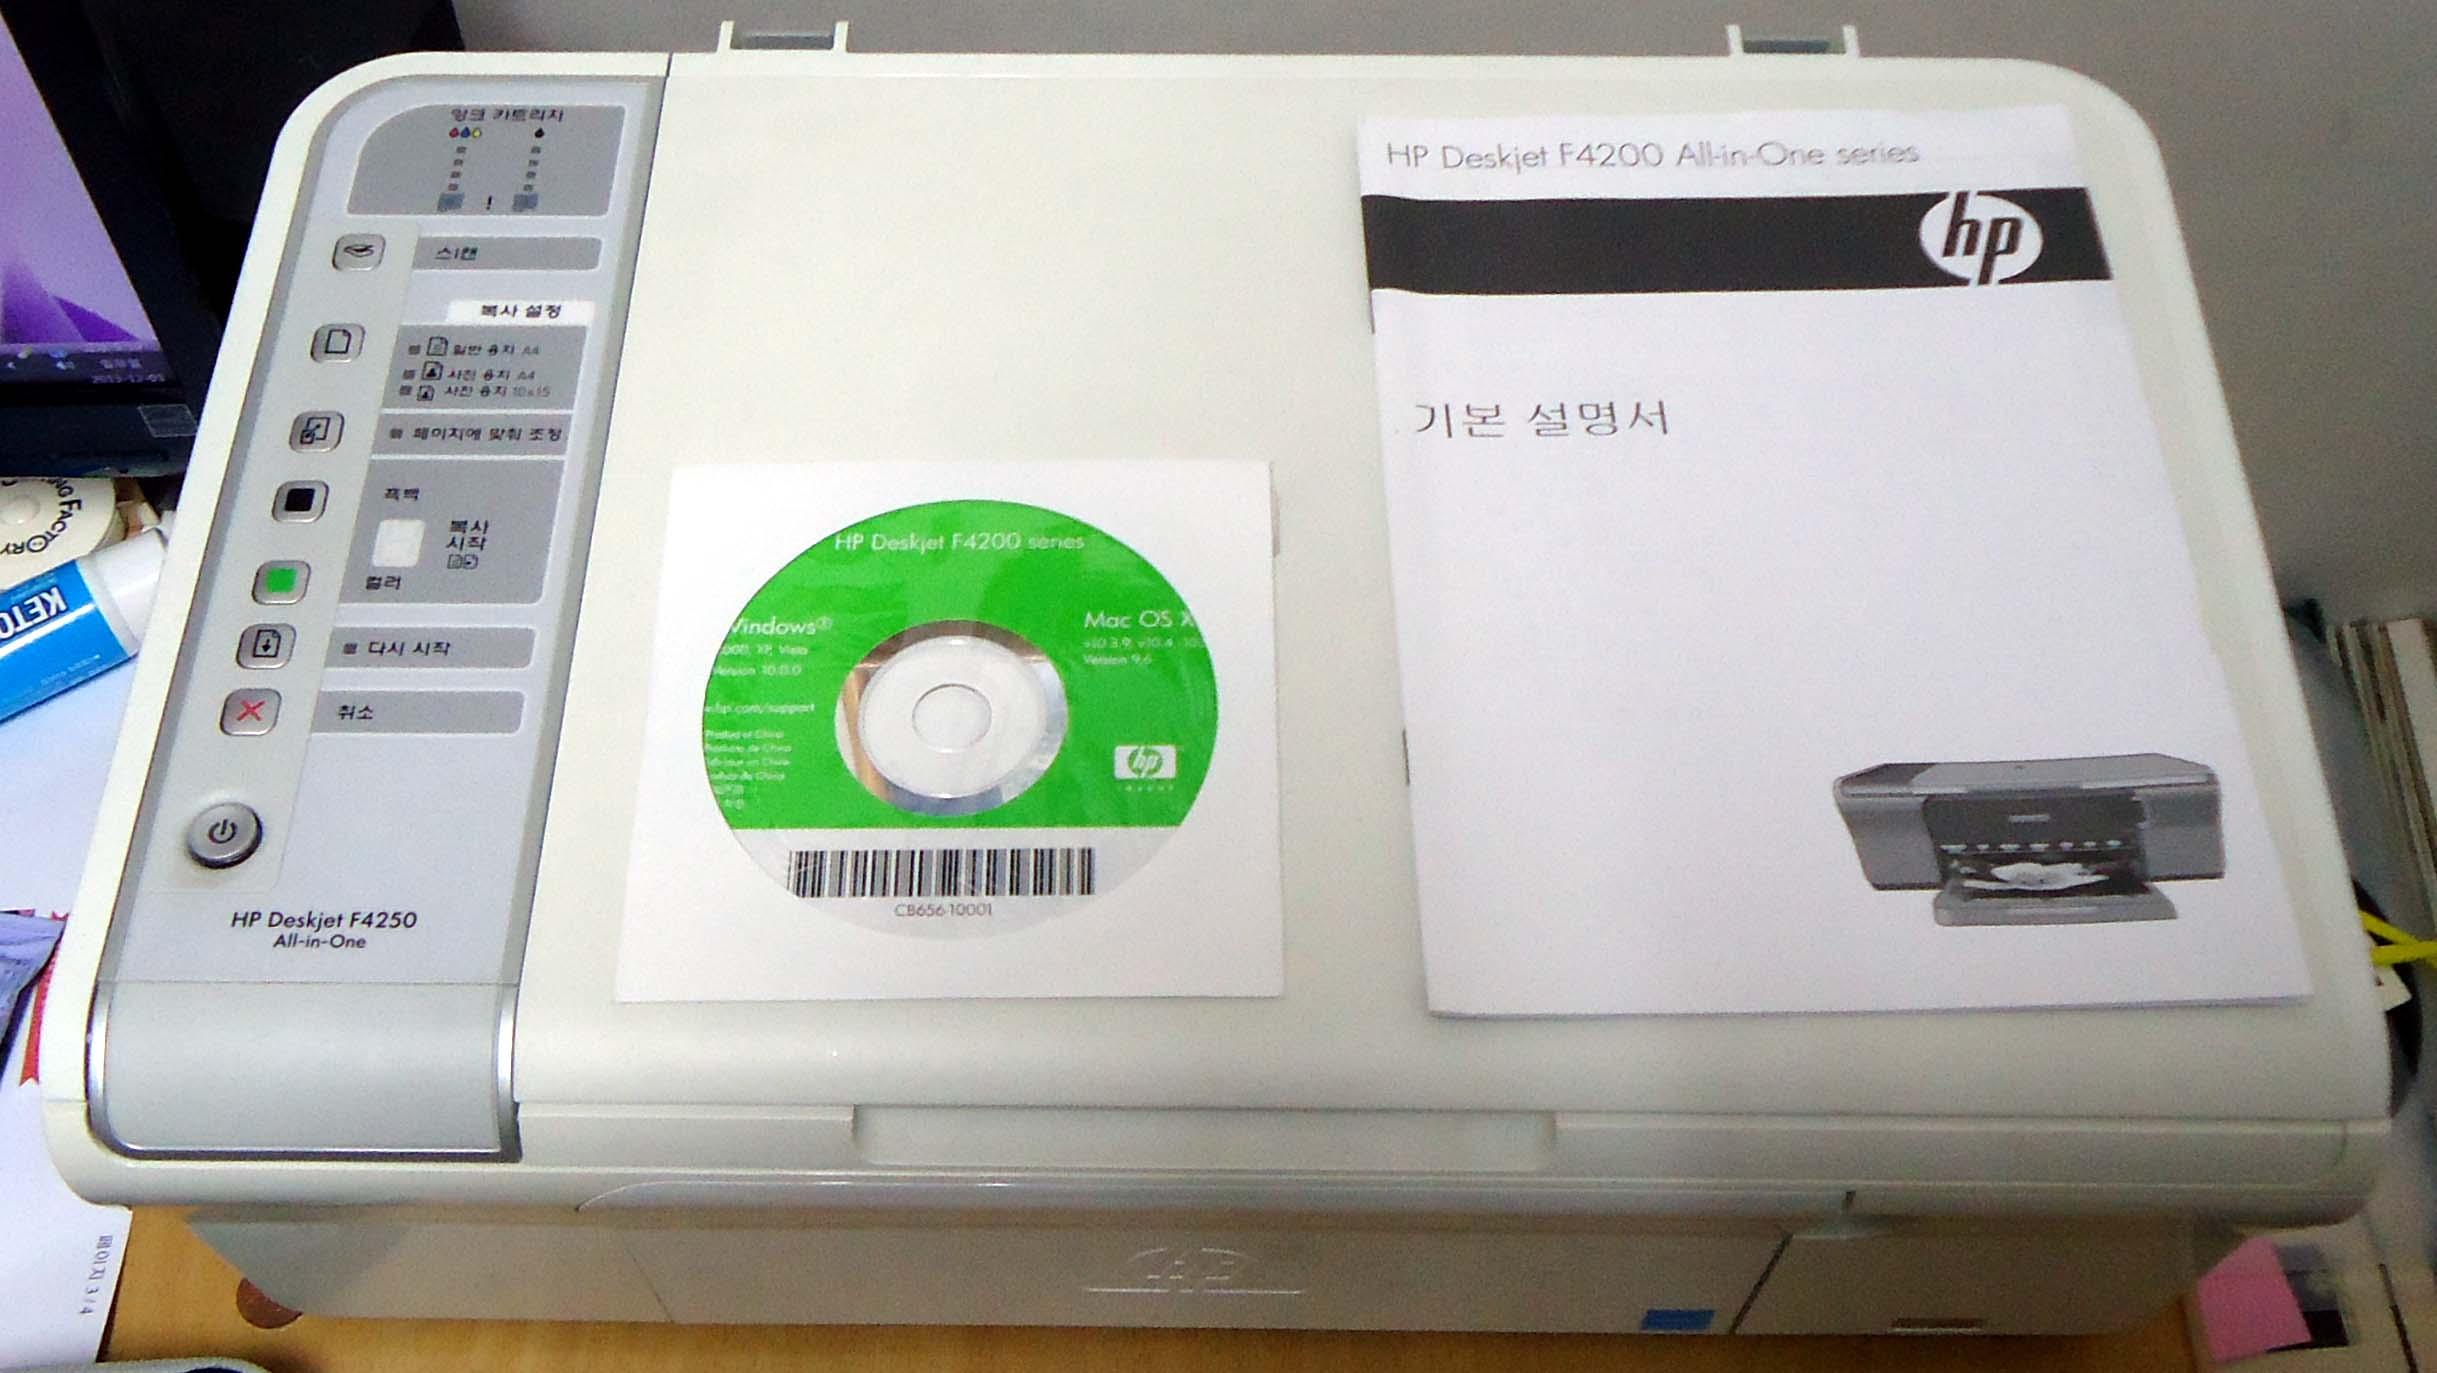 HP Deskjet F4200(복합기) 드립니다. [스캐너..